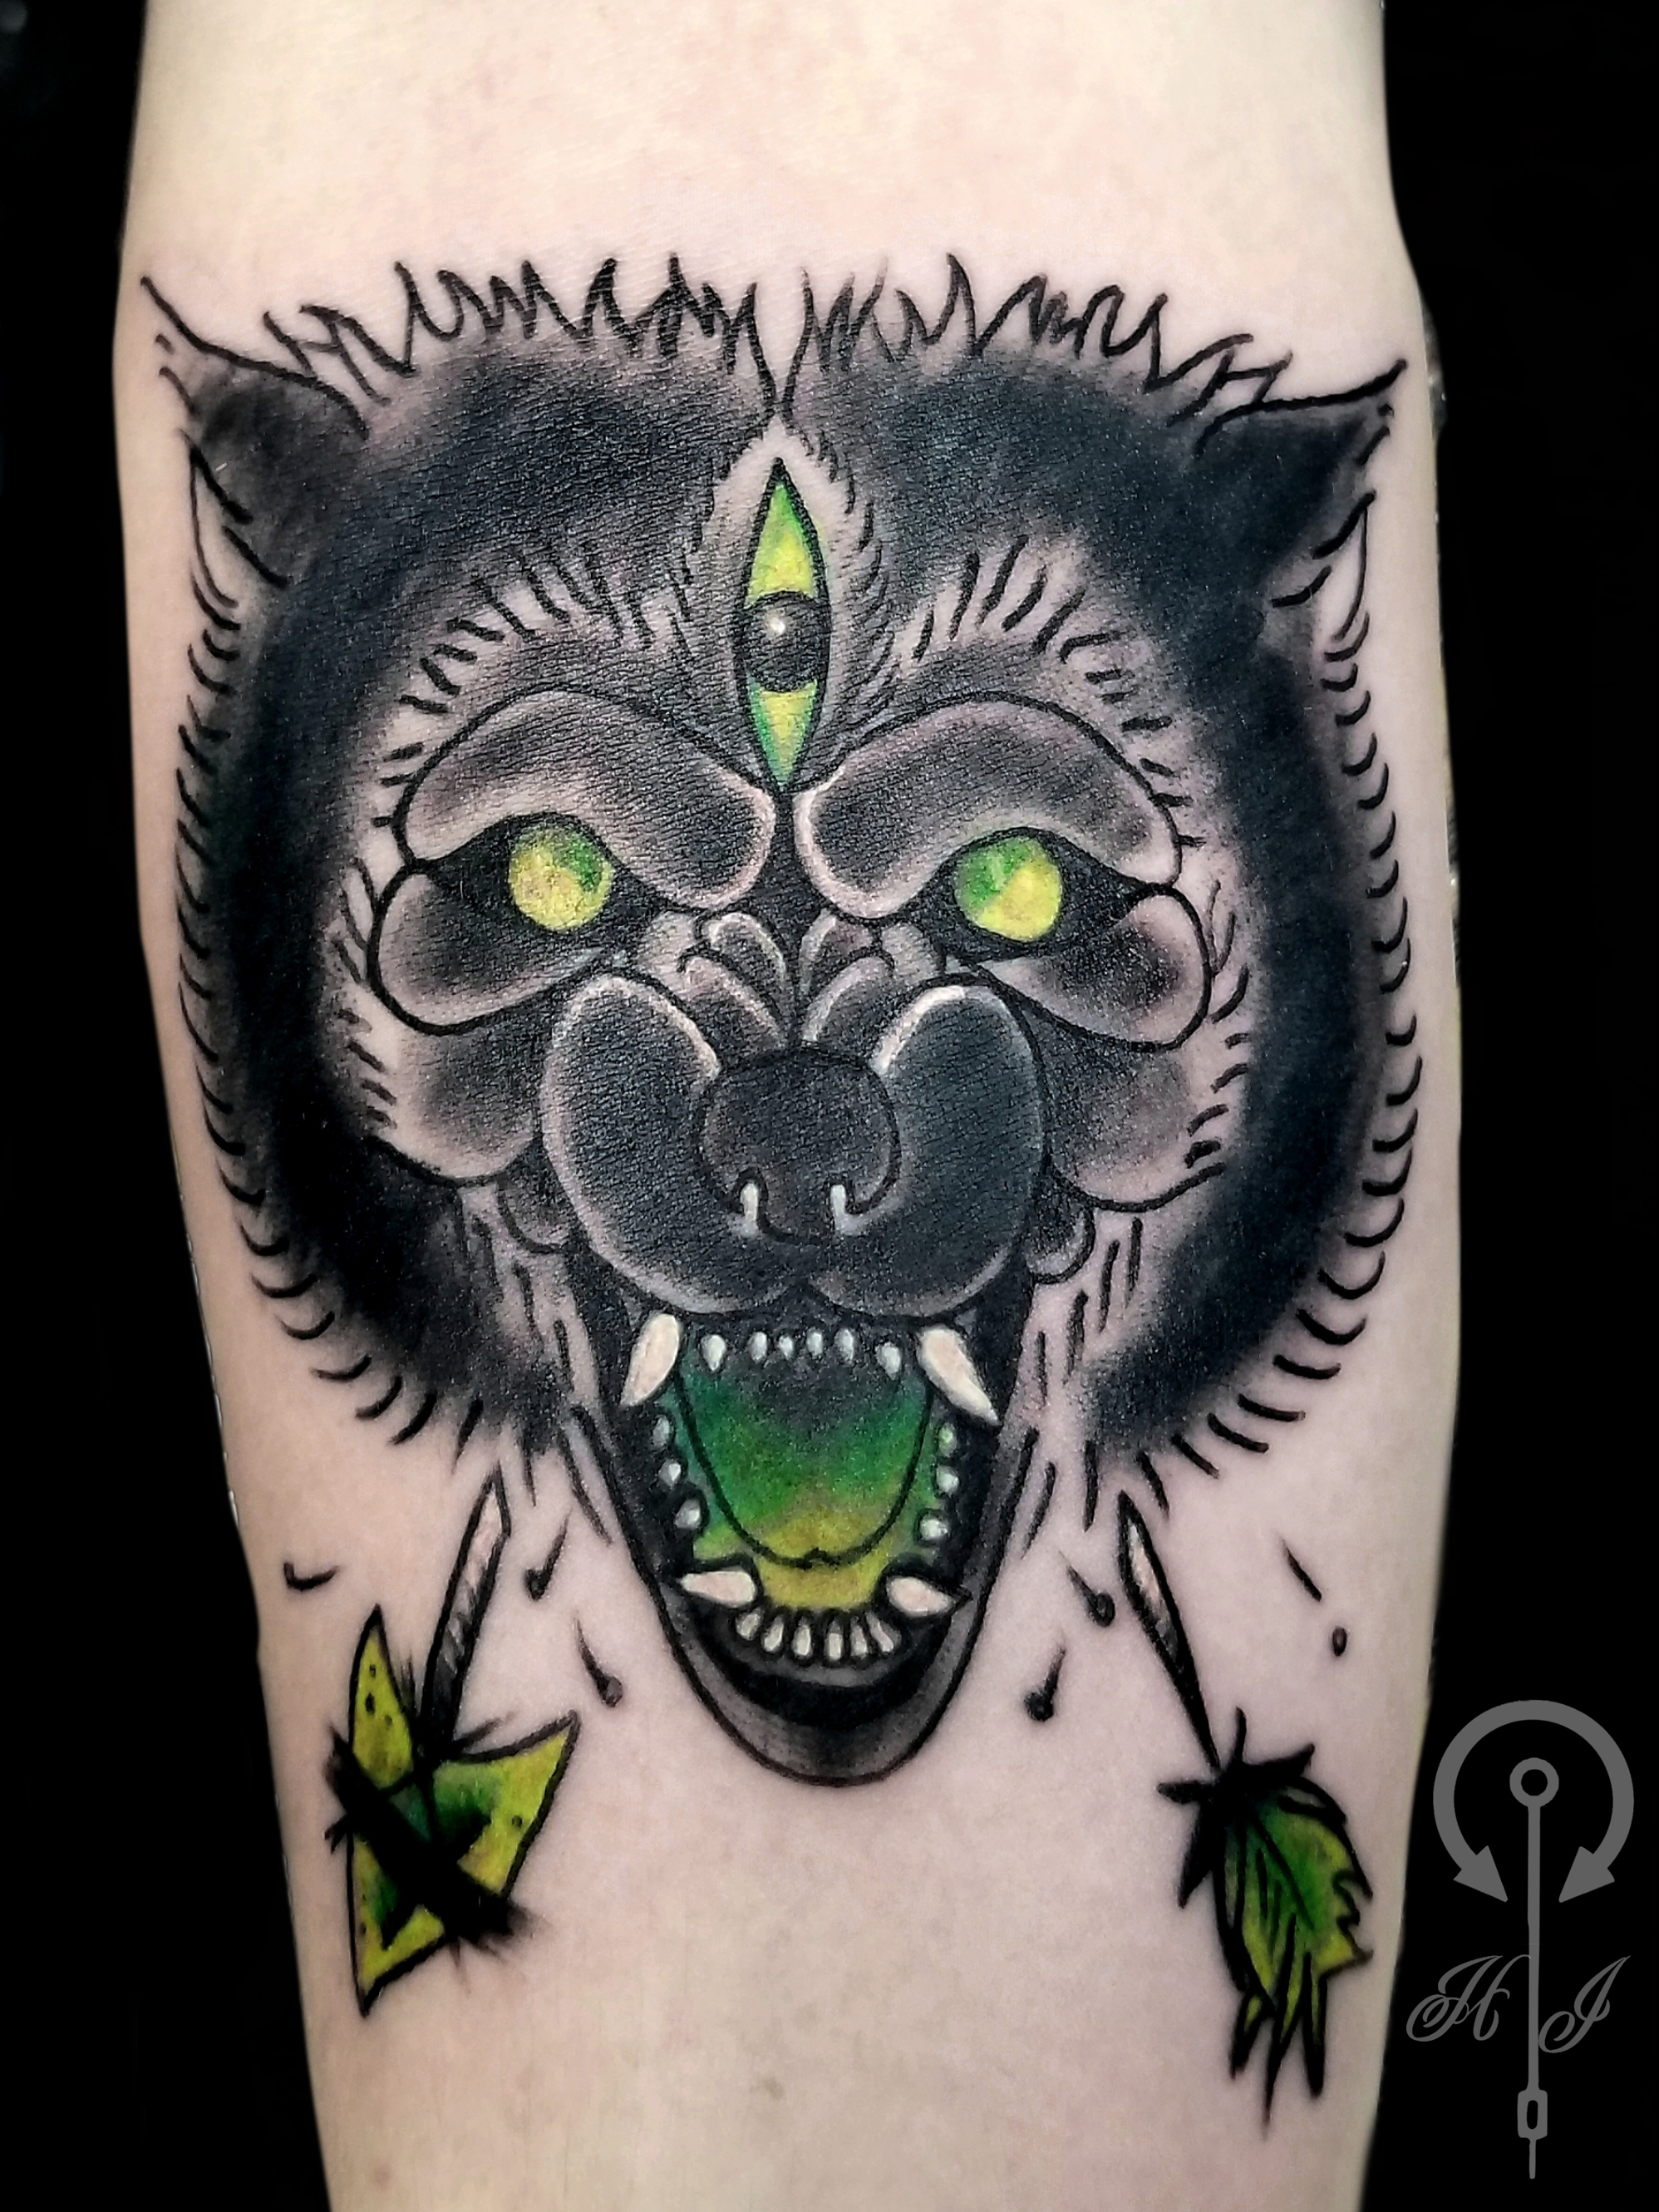 zwolf.jpg